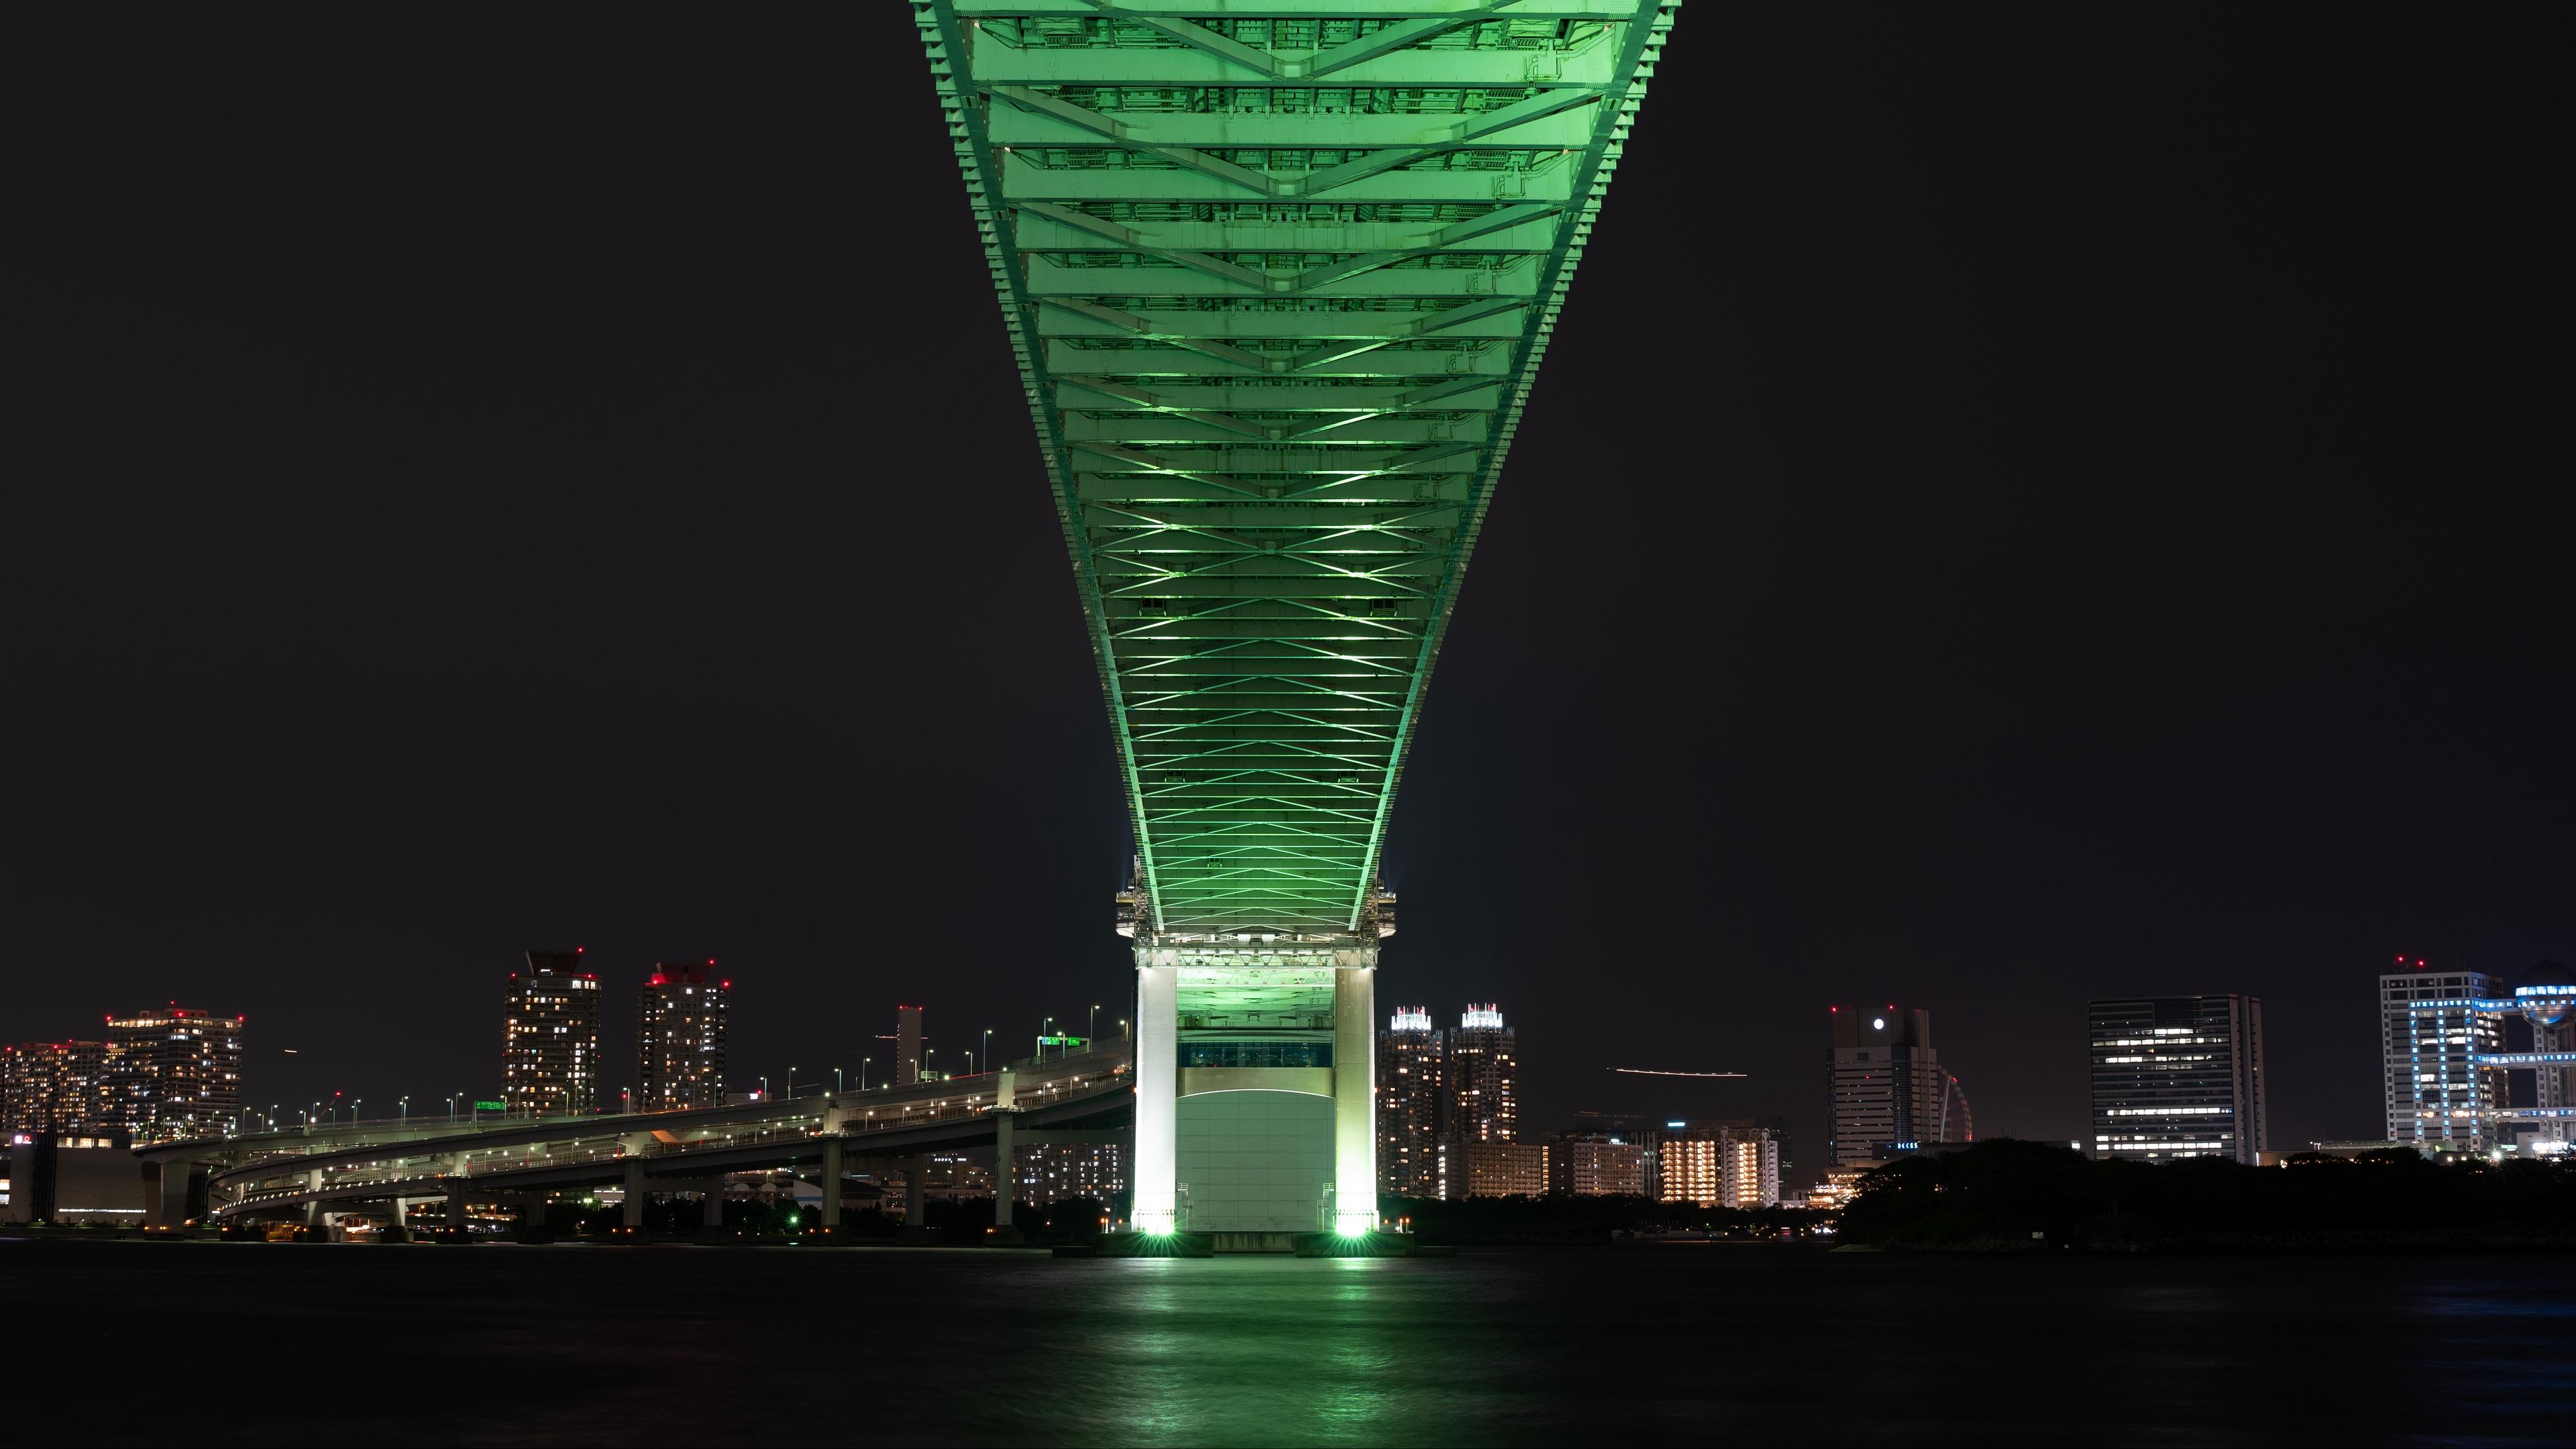 bridge night city tokyo japan 4k 1538066635 - bridge, night city, tokyo, japan 4k - Tokyo, night city, bridge